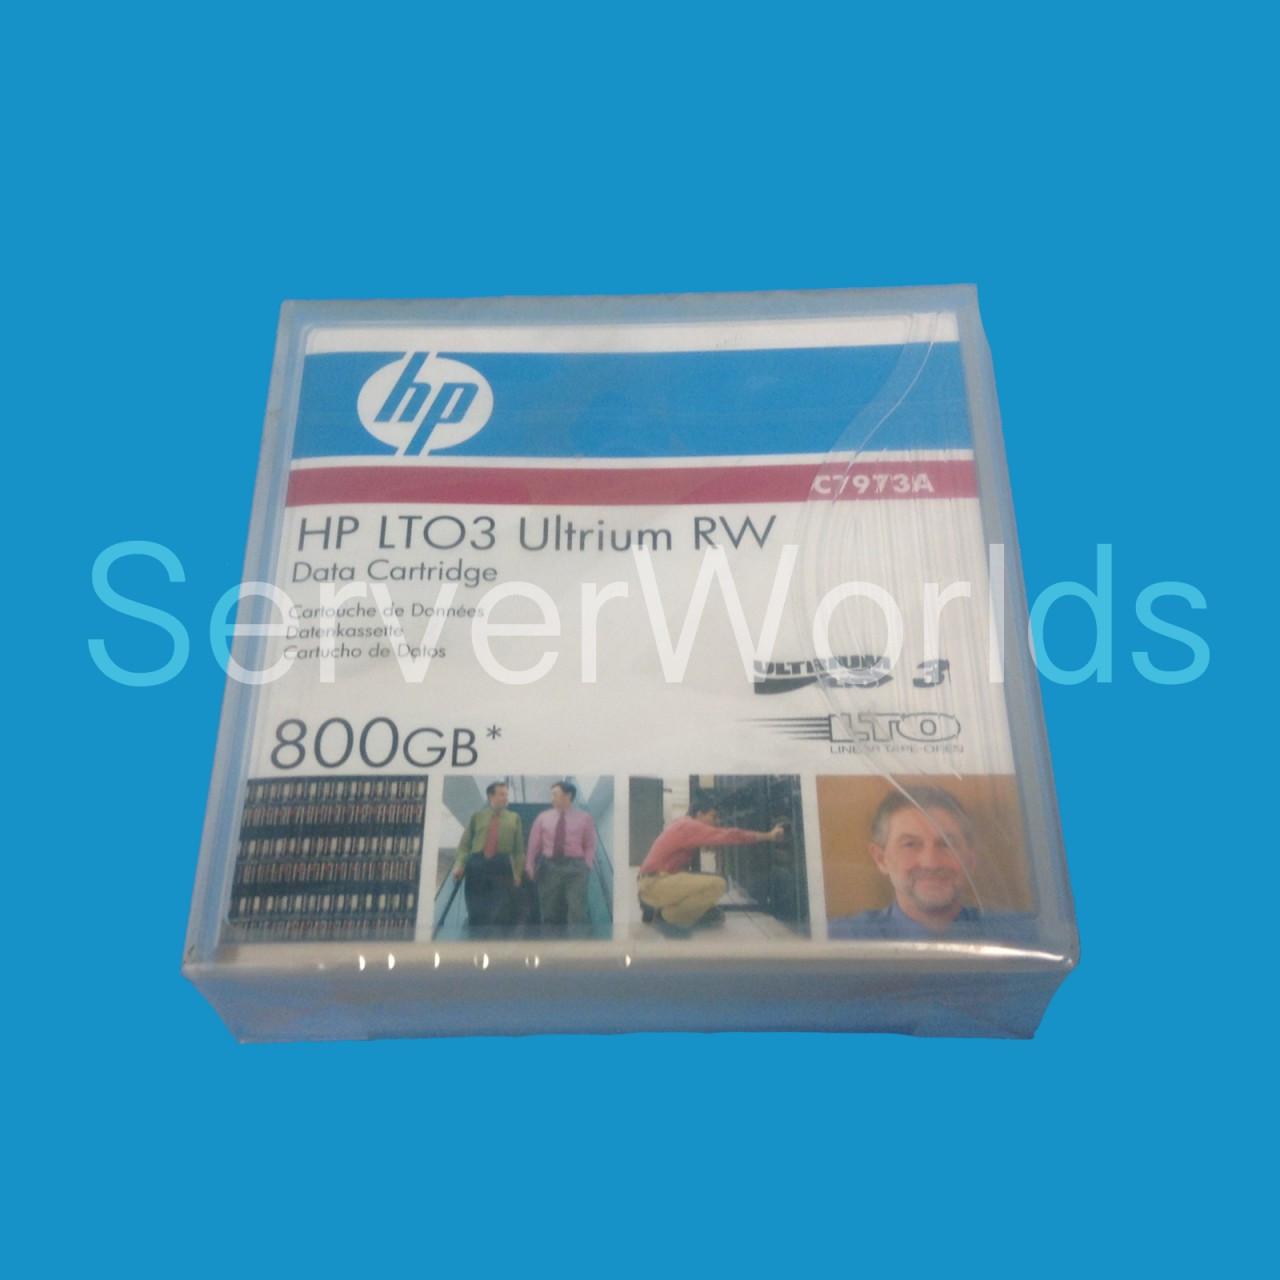 HP LTO-3 Ultrium RW Data Cartridge 800GB C7973-60000